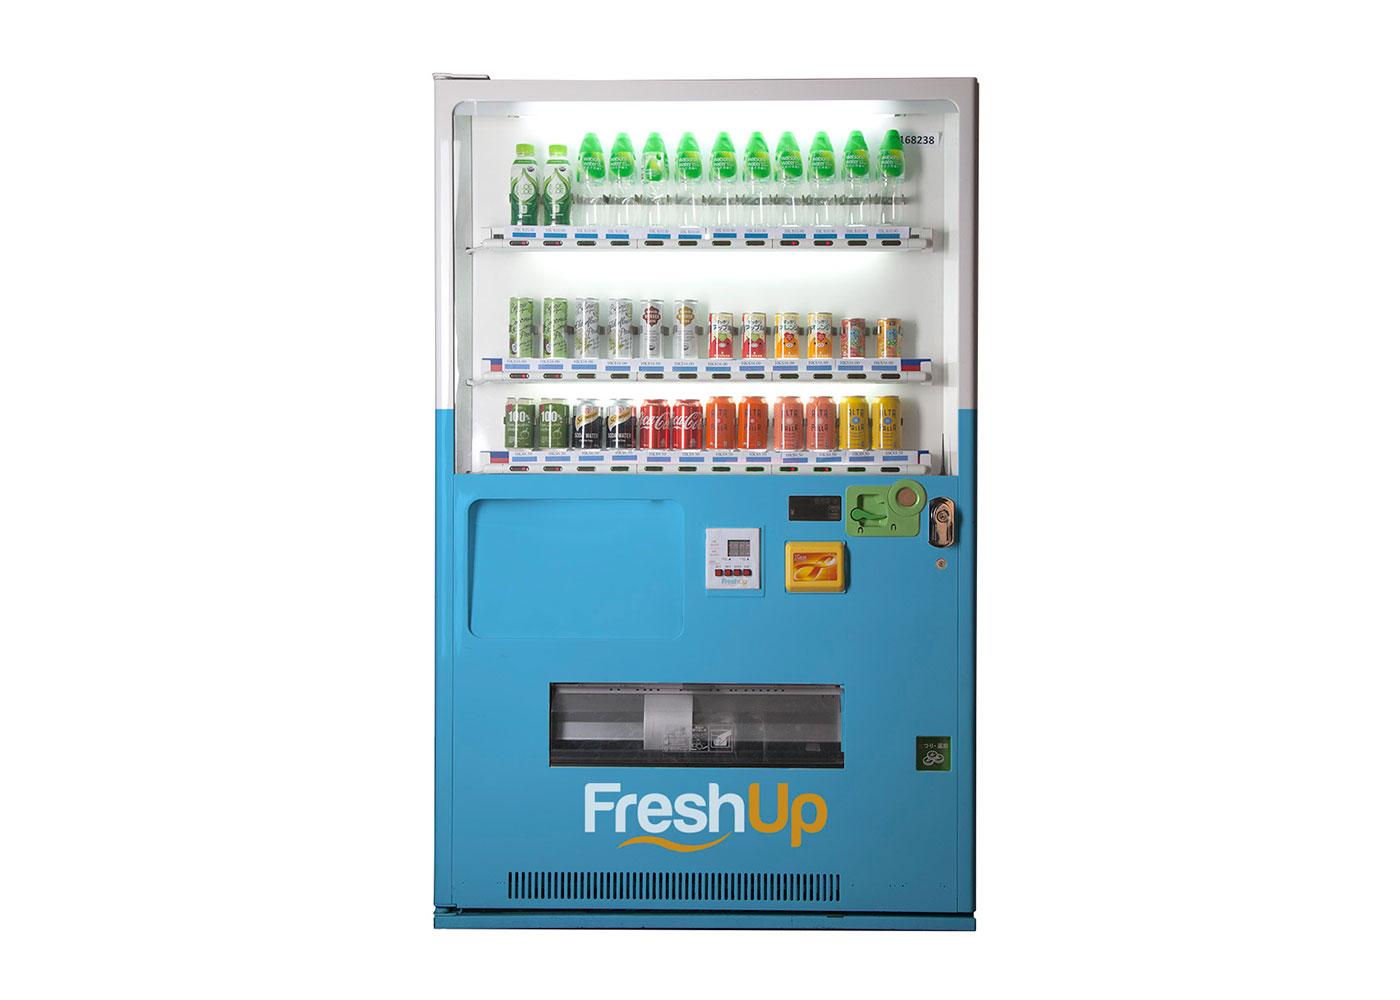 FreshUp, drinks, vending machine hong kong, beverages, fast, convenient, smart vending machine hong kong, freshup vending machine